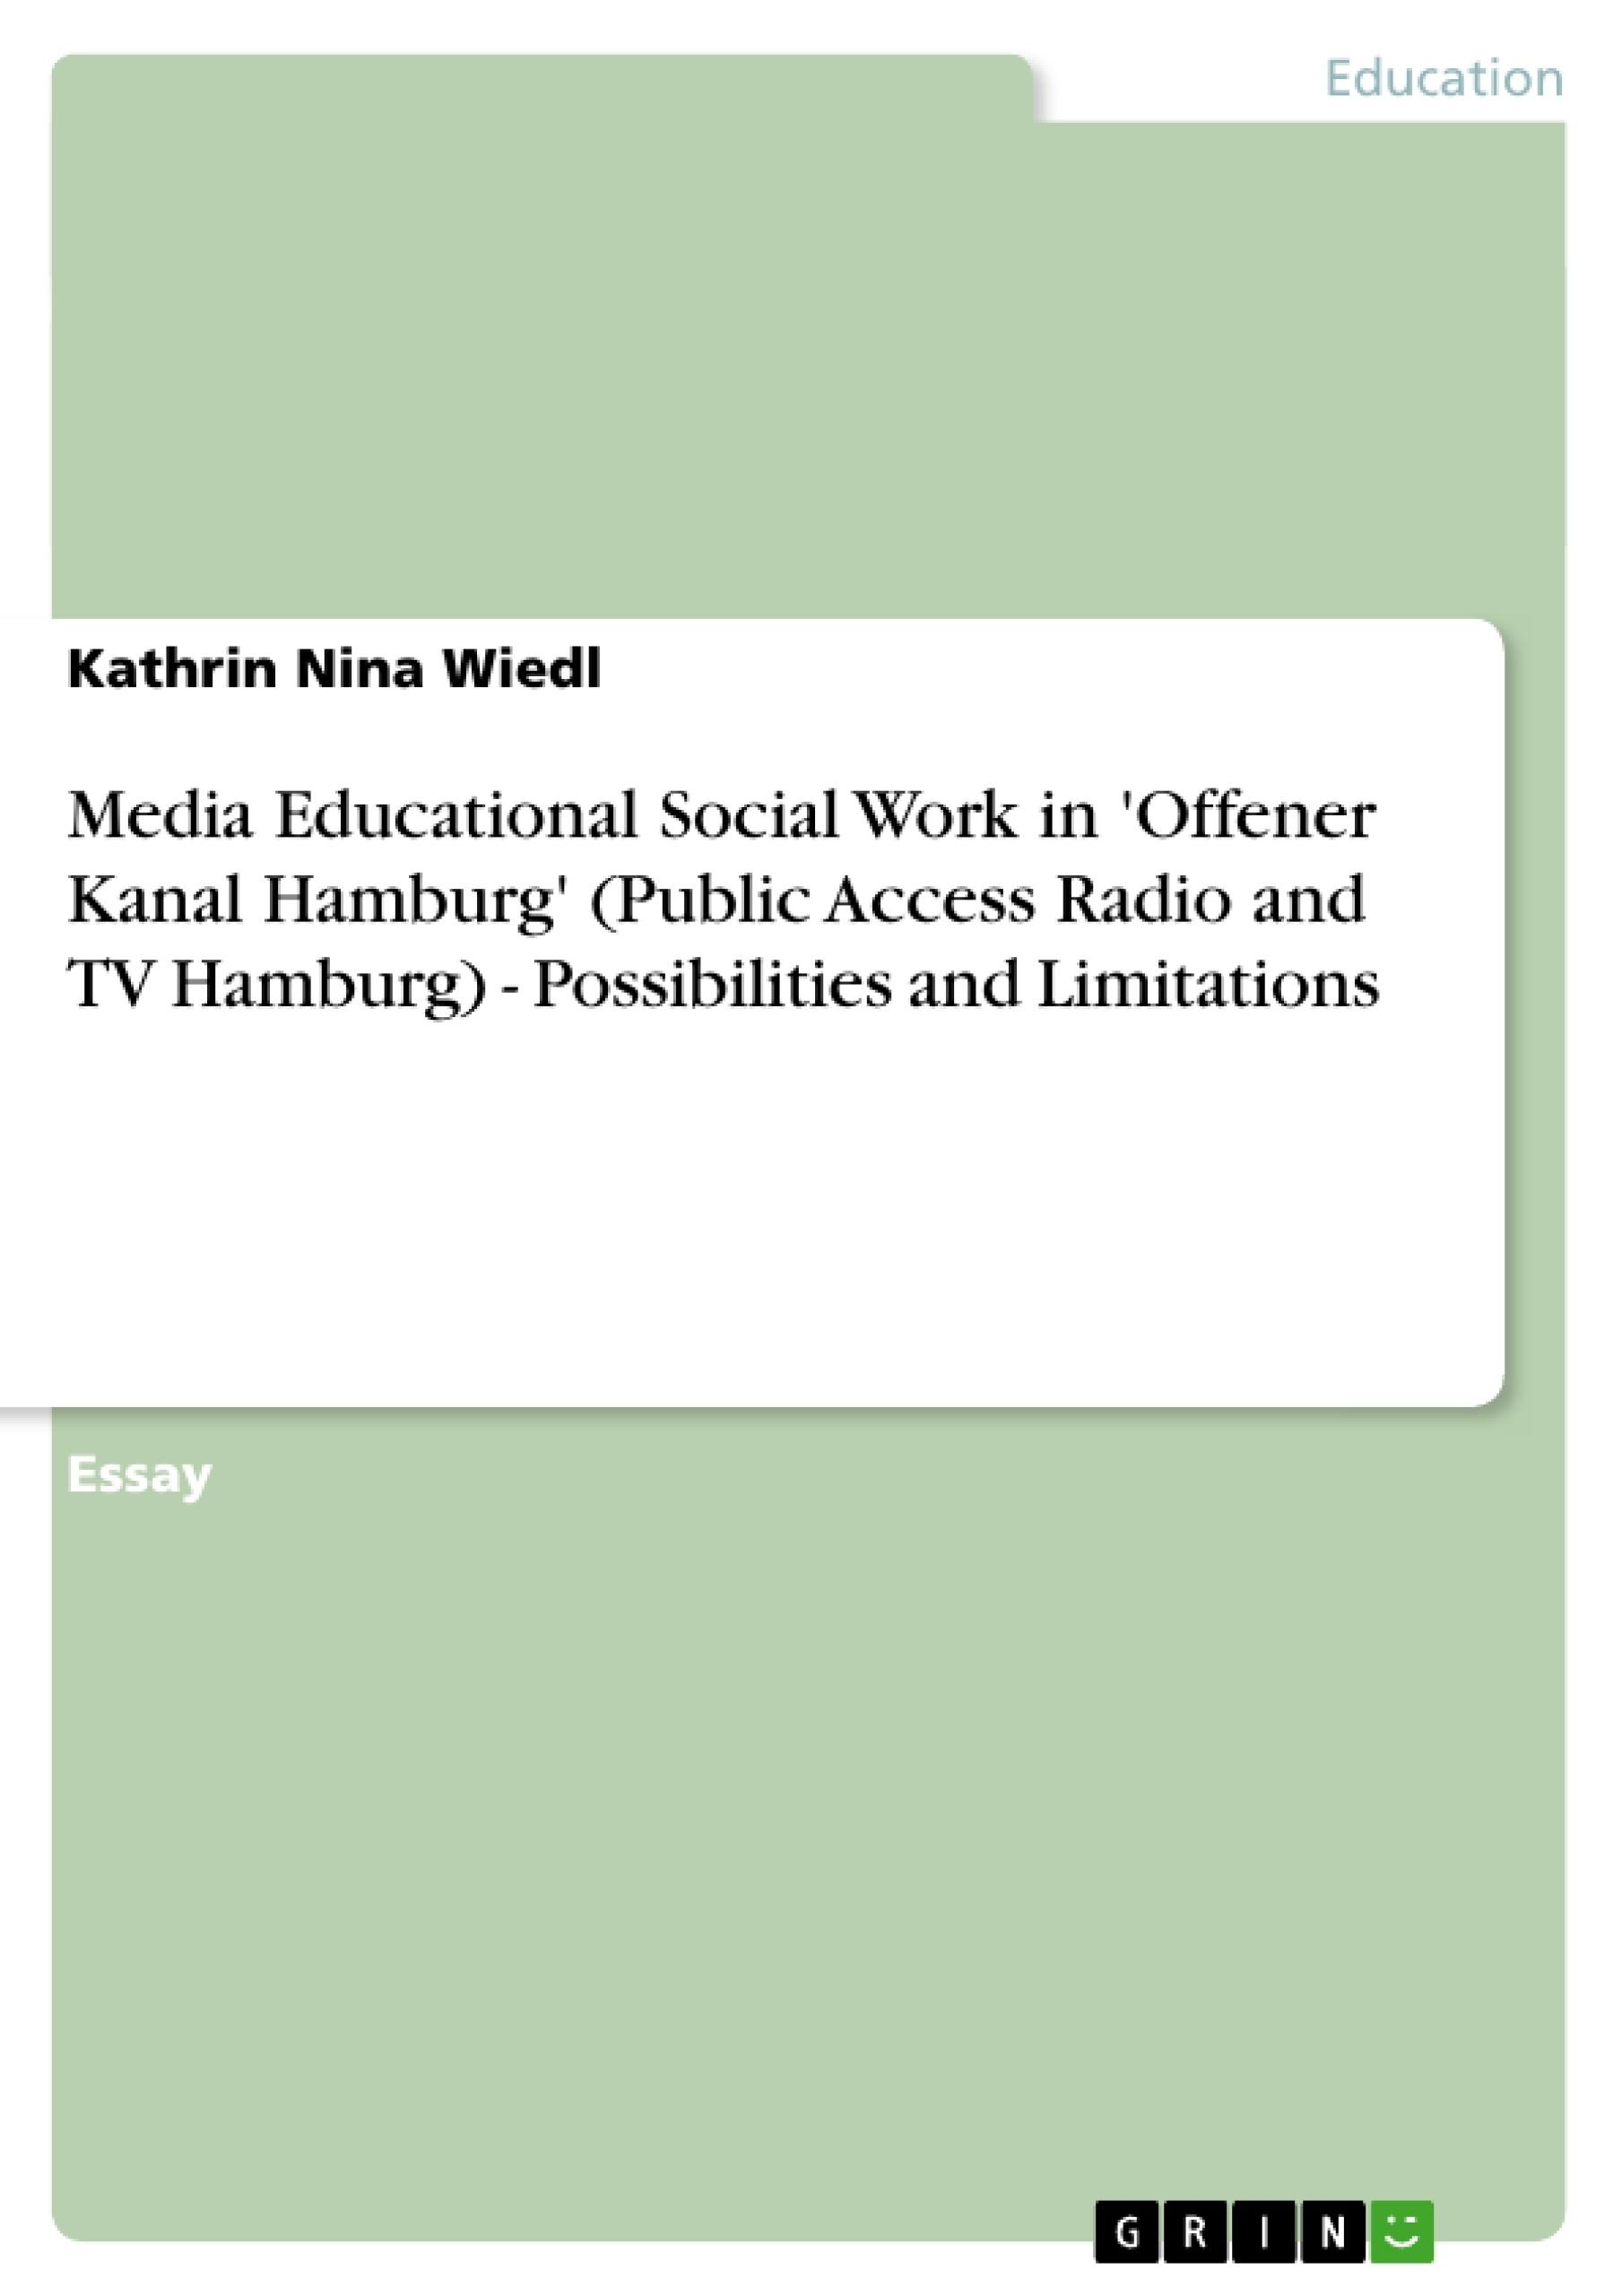 Title: Media Educational Social Work in 'Offener Kanal Hamburg' (Public Access Radio and TV Hamburg) - Possibilities and Limitations